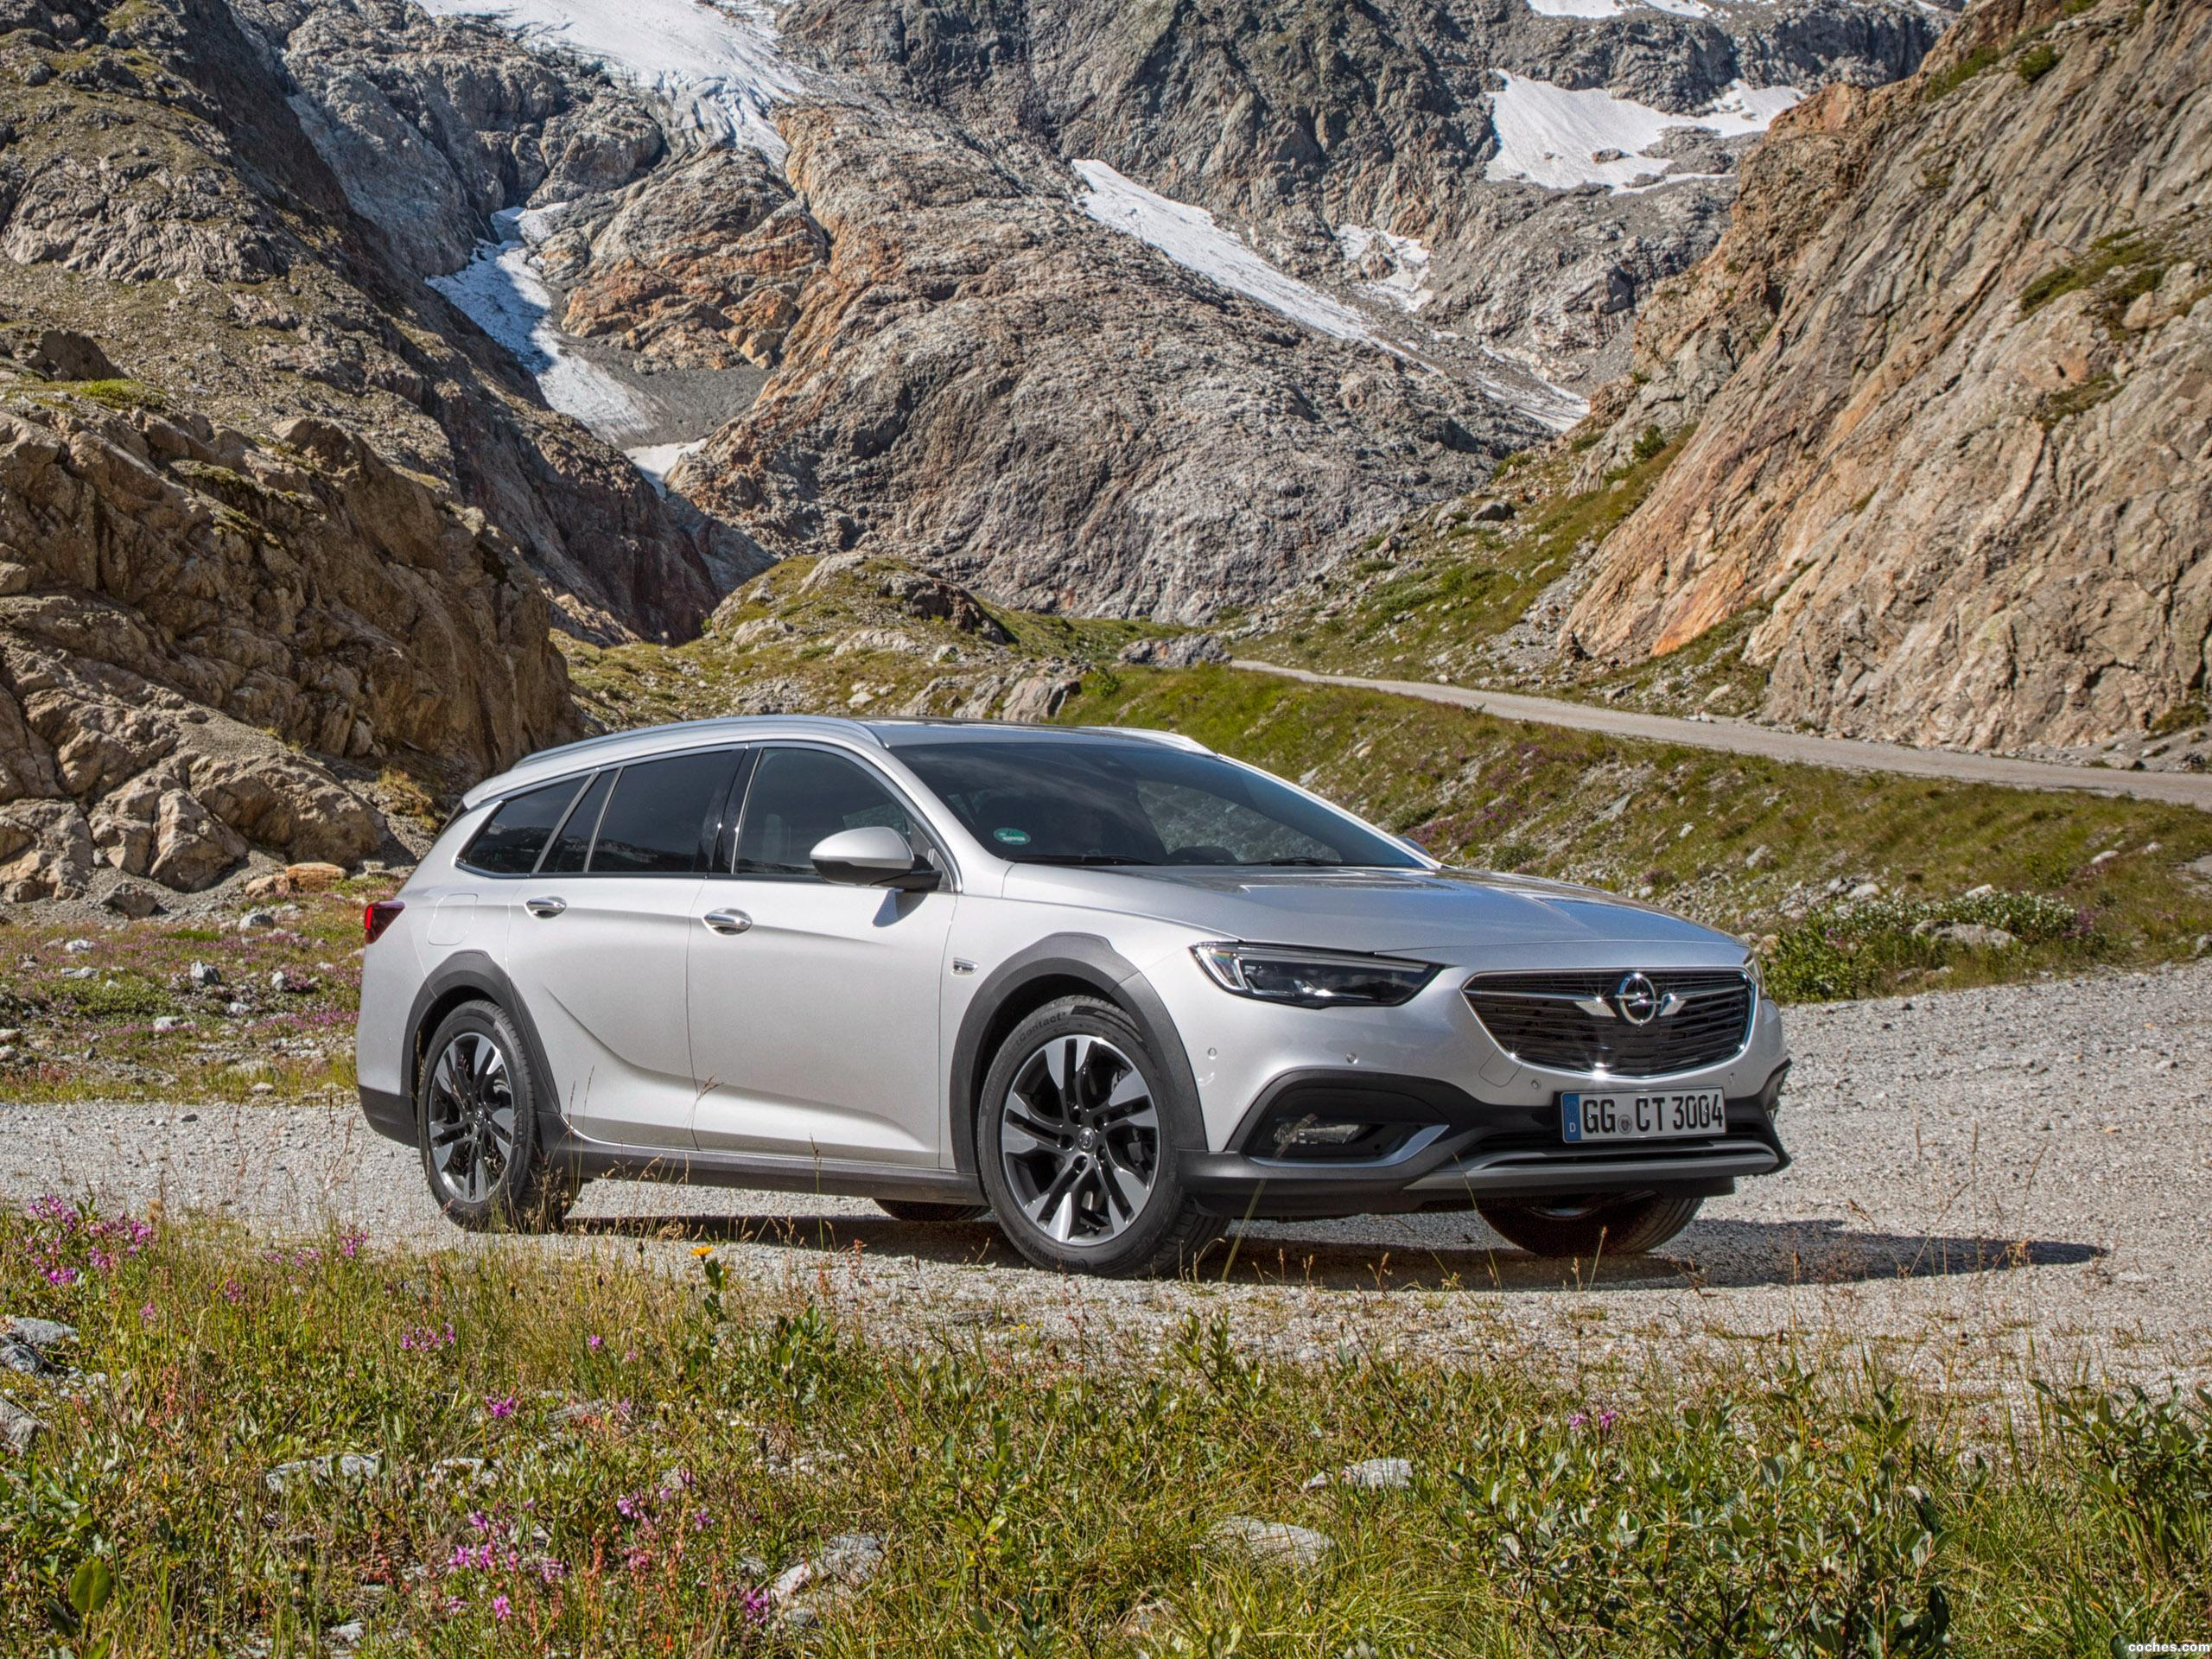 Foto 16 de Opel Insignia Country Tourer Turbo 4x4 2017